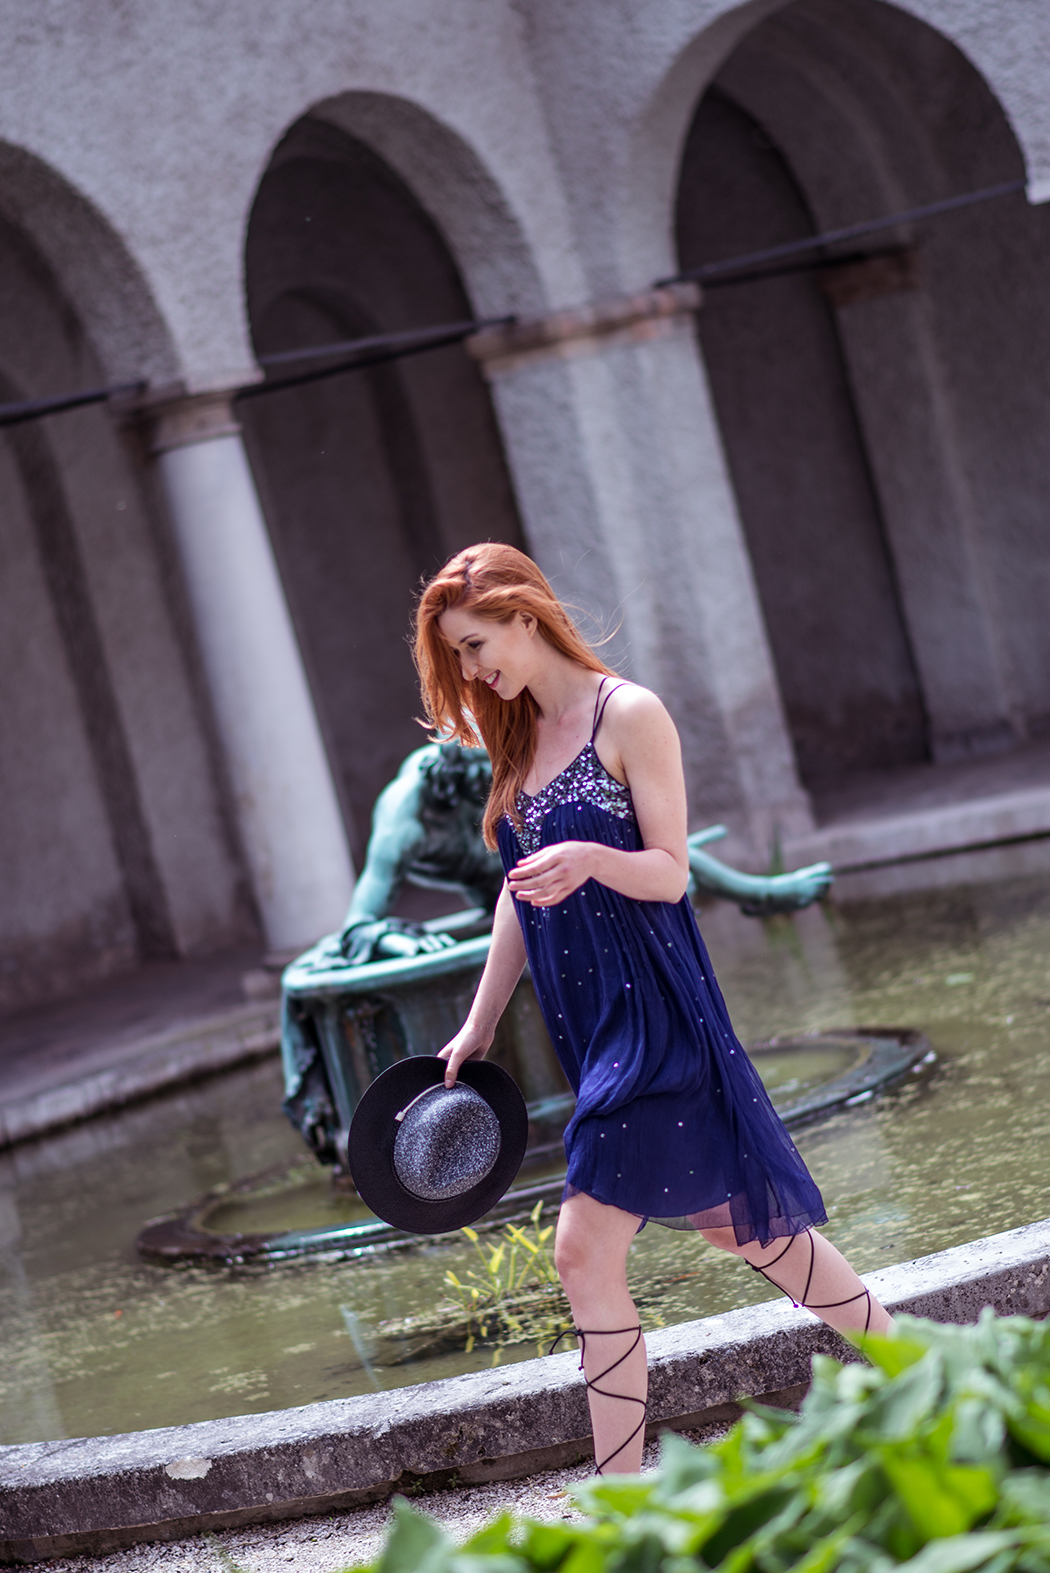 Fashionblog-Fashionblogger-Fashion-Blog-München-Deutschland-Conleys-Fashion-Gladiatorensandalen-blaues-Pailettenkleid-Linda-Rella-Lindarella-Fitnessblog-4